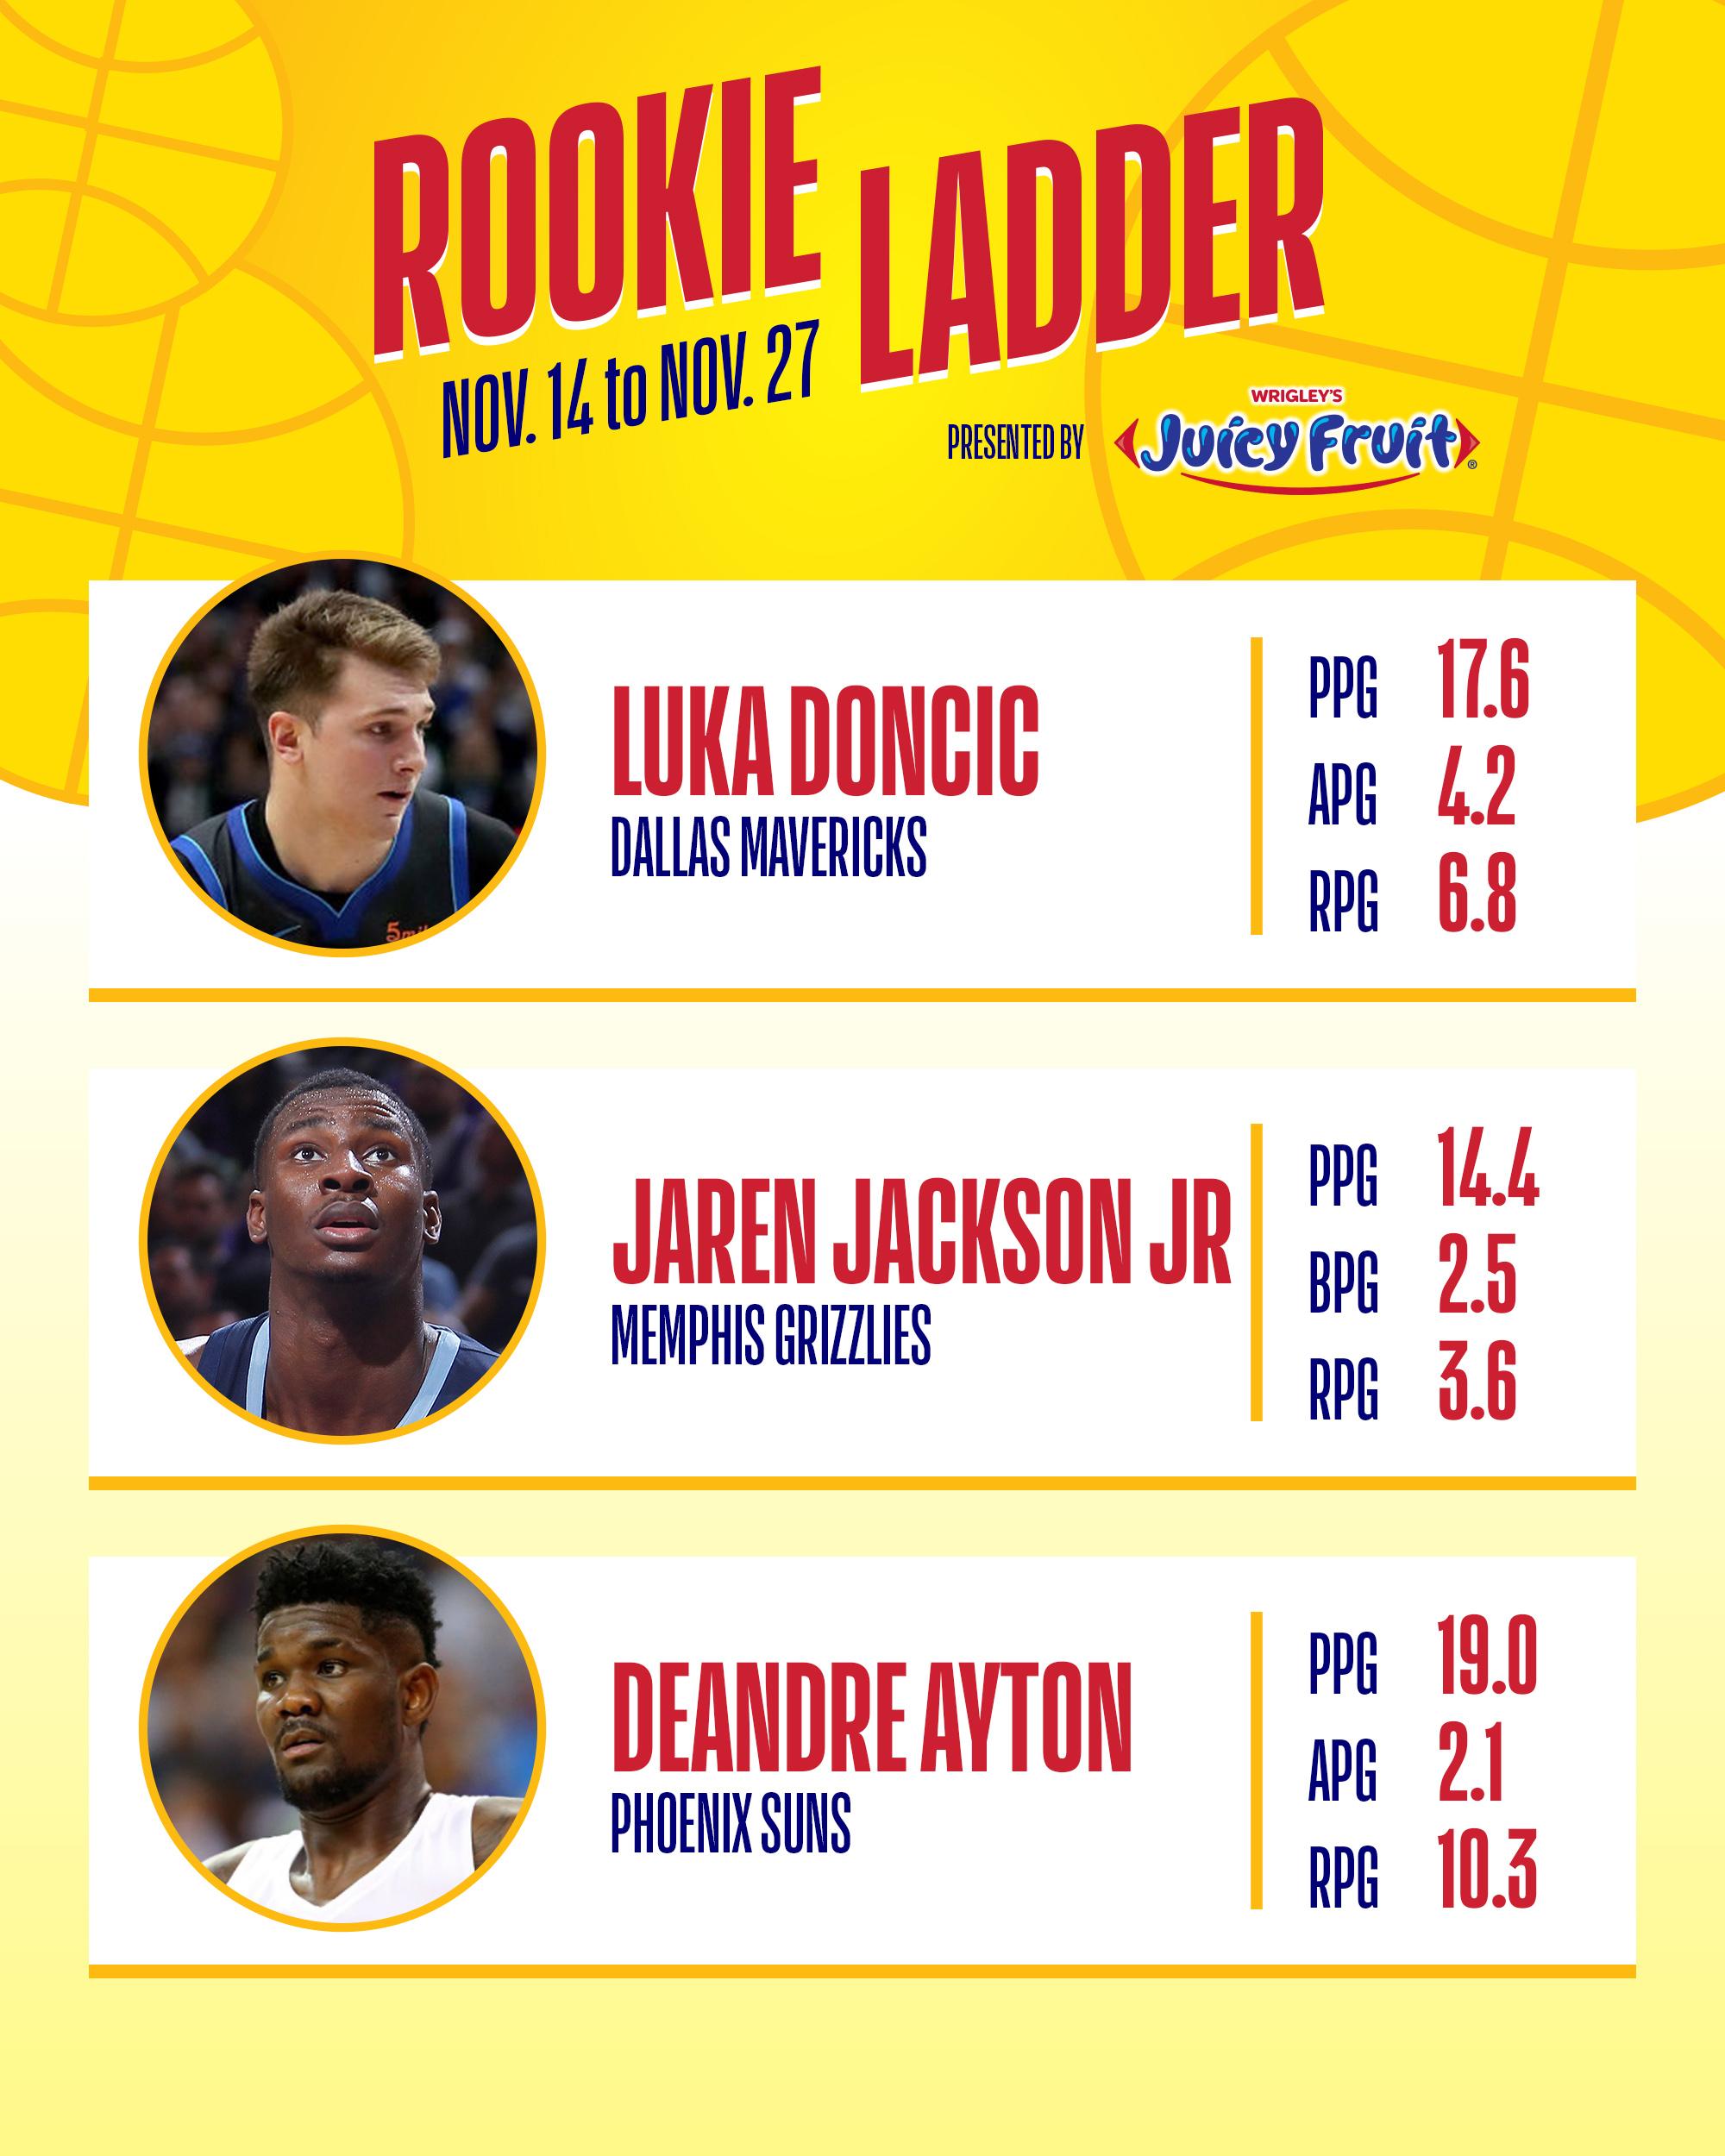 NBA Rookie Ladder Presented By Juicy Fruit: Luka Doncic